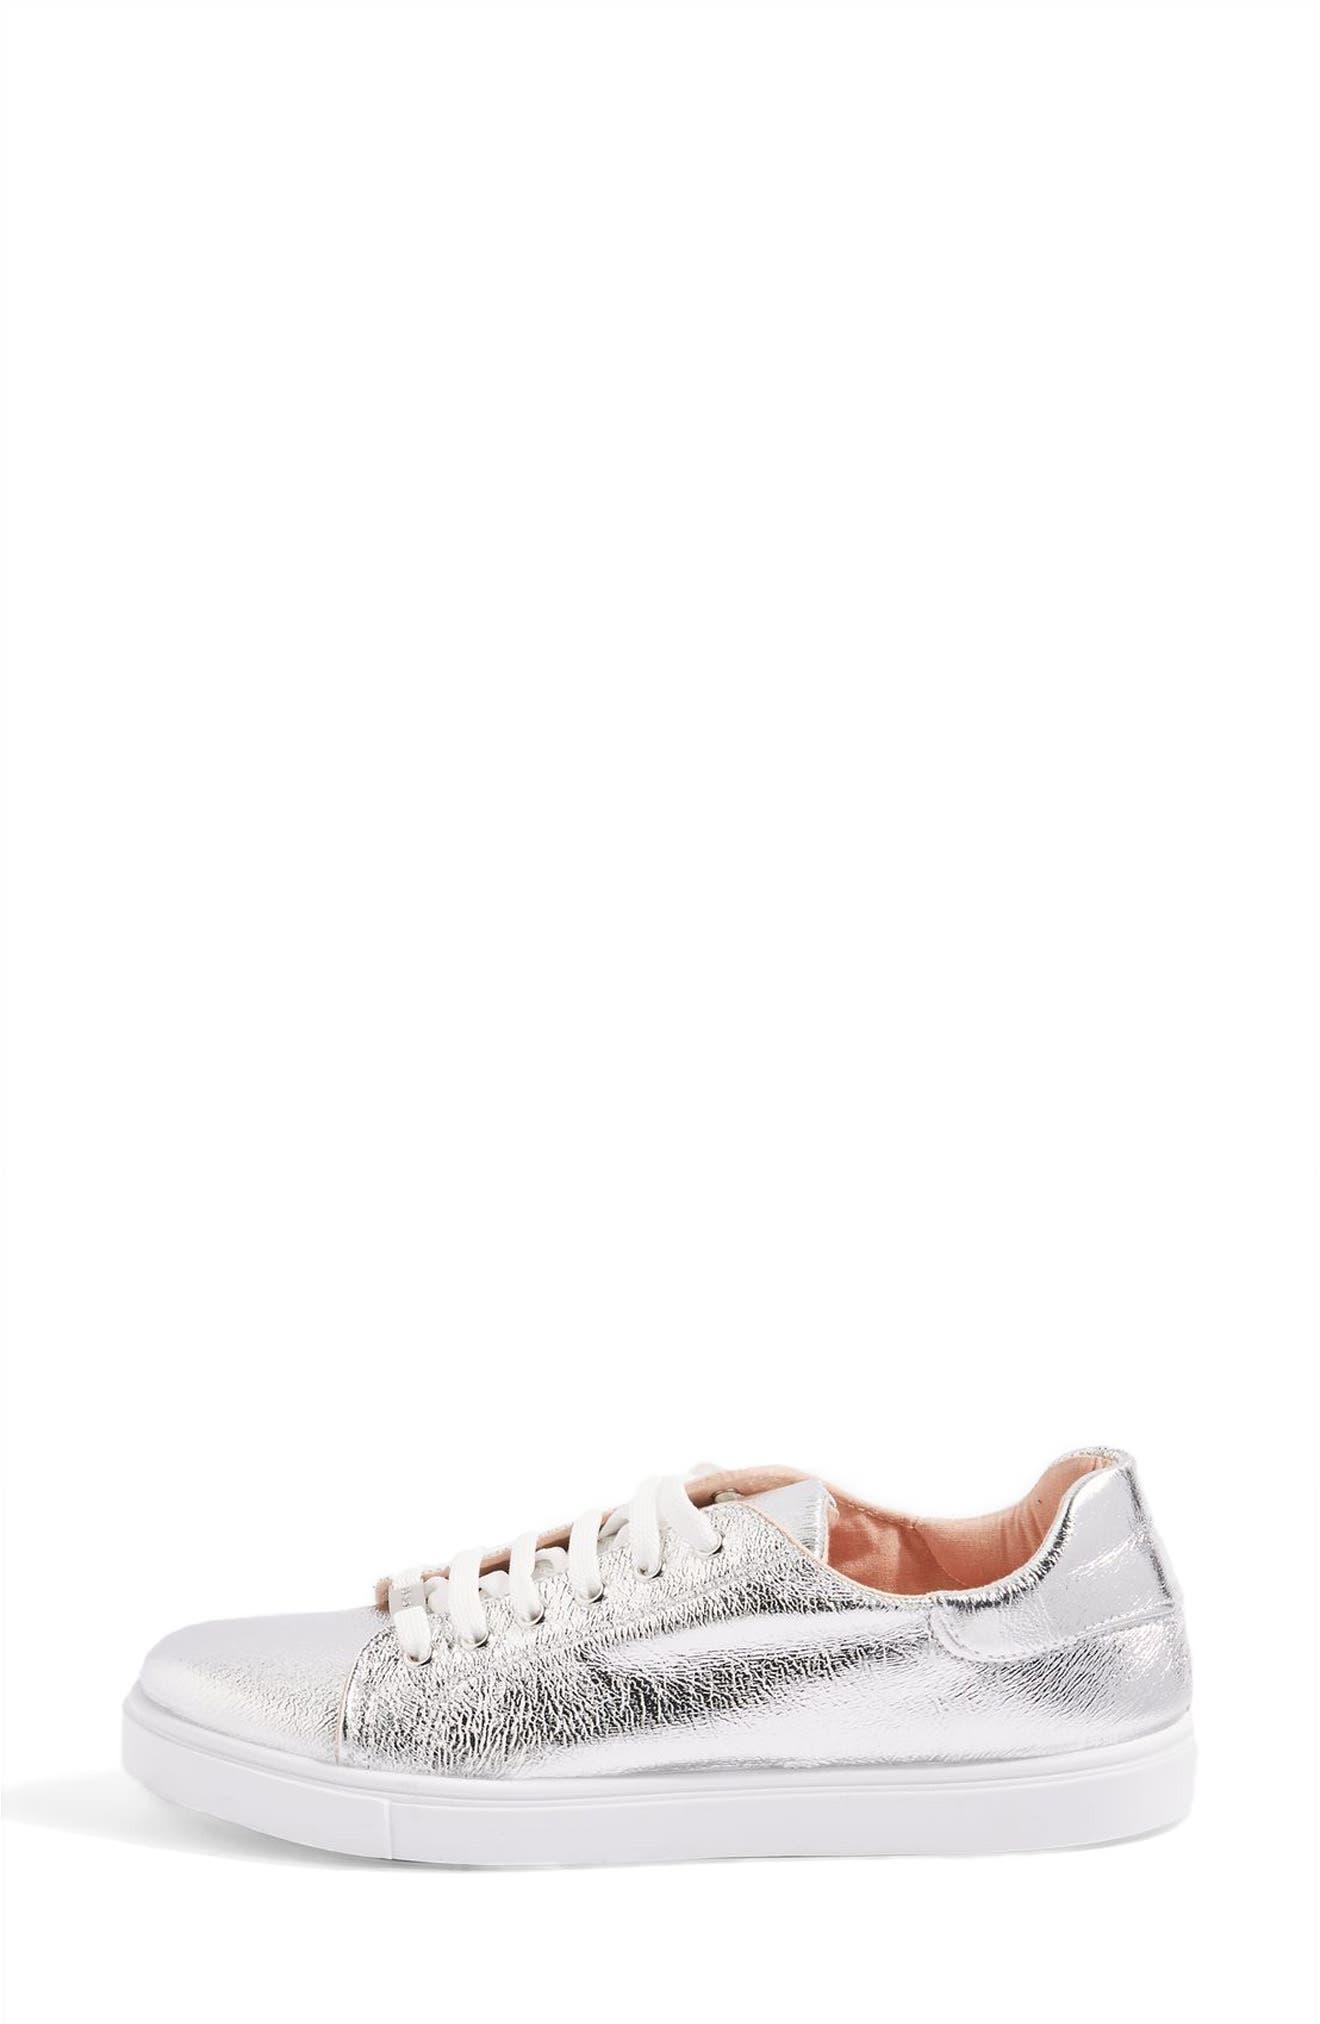 Alternate Image 2  - Topshop Cosmo Metallic Lace-Up Sneaker (Women)